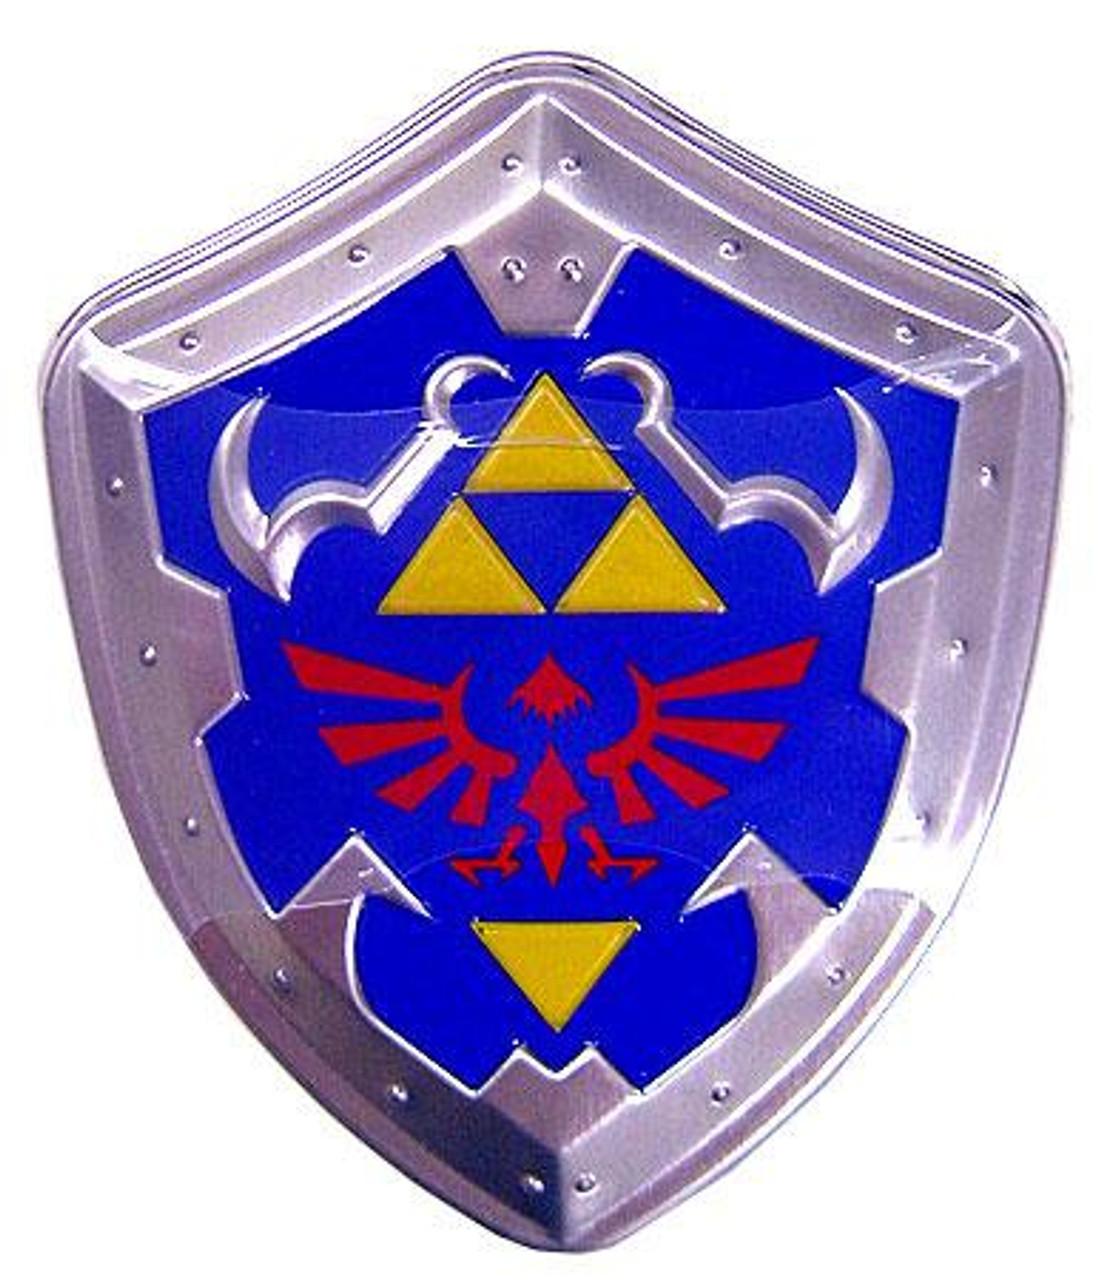 The Legend of Zelda Ocarina of Time Ice Arrow Mints Candy Tin